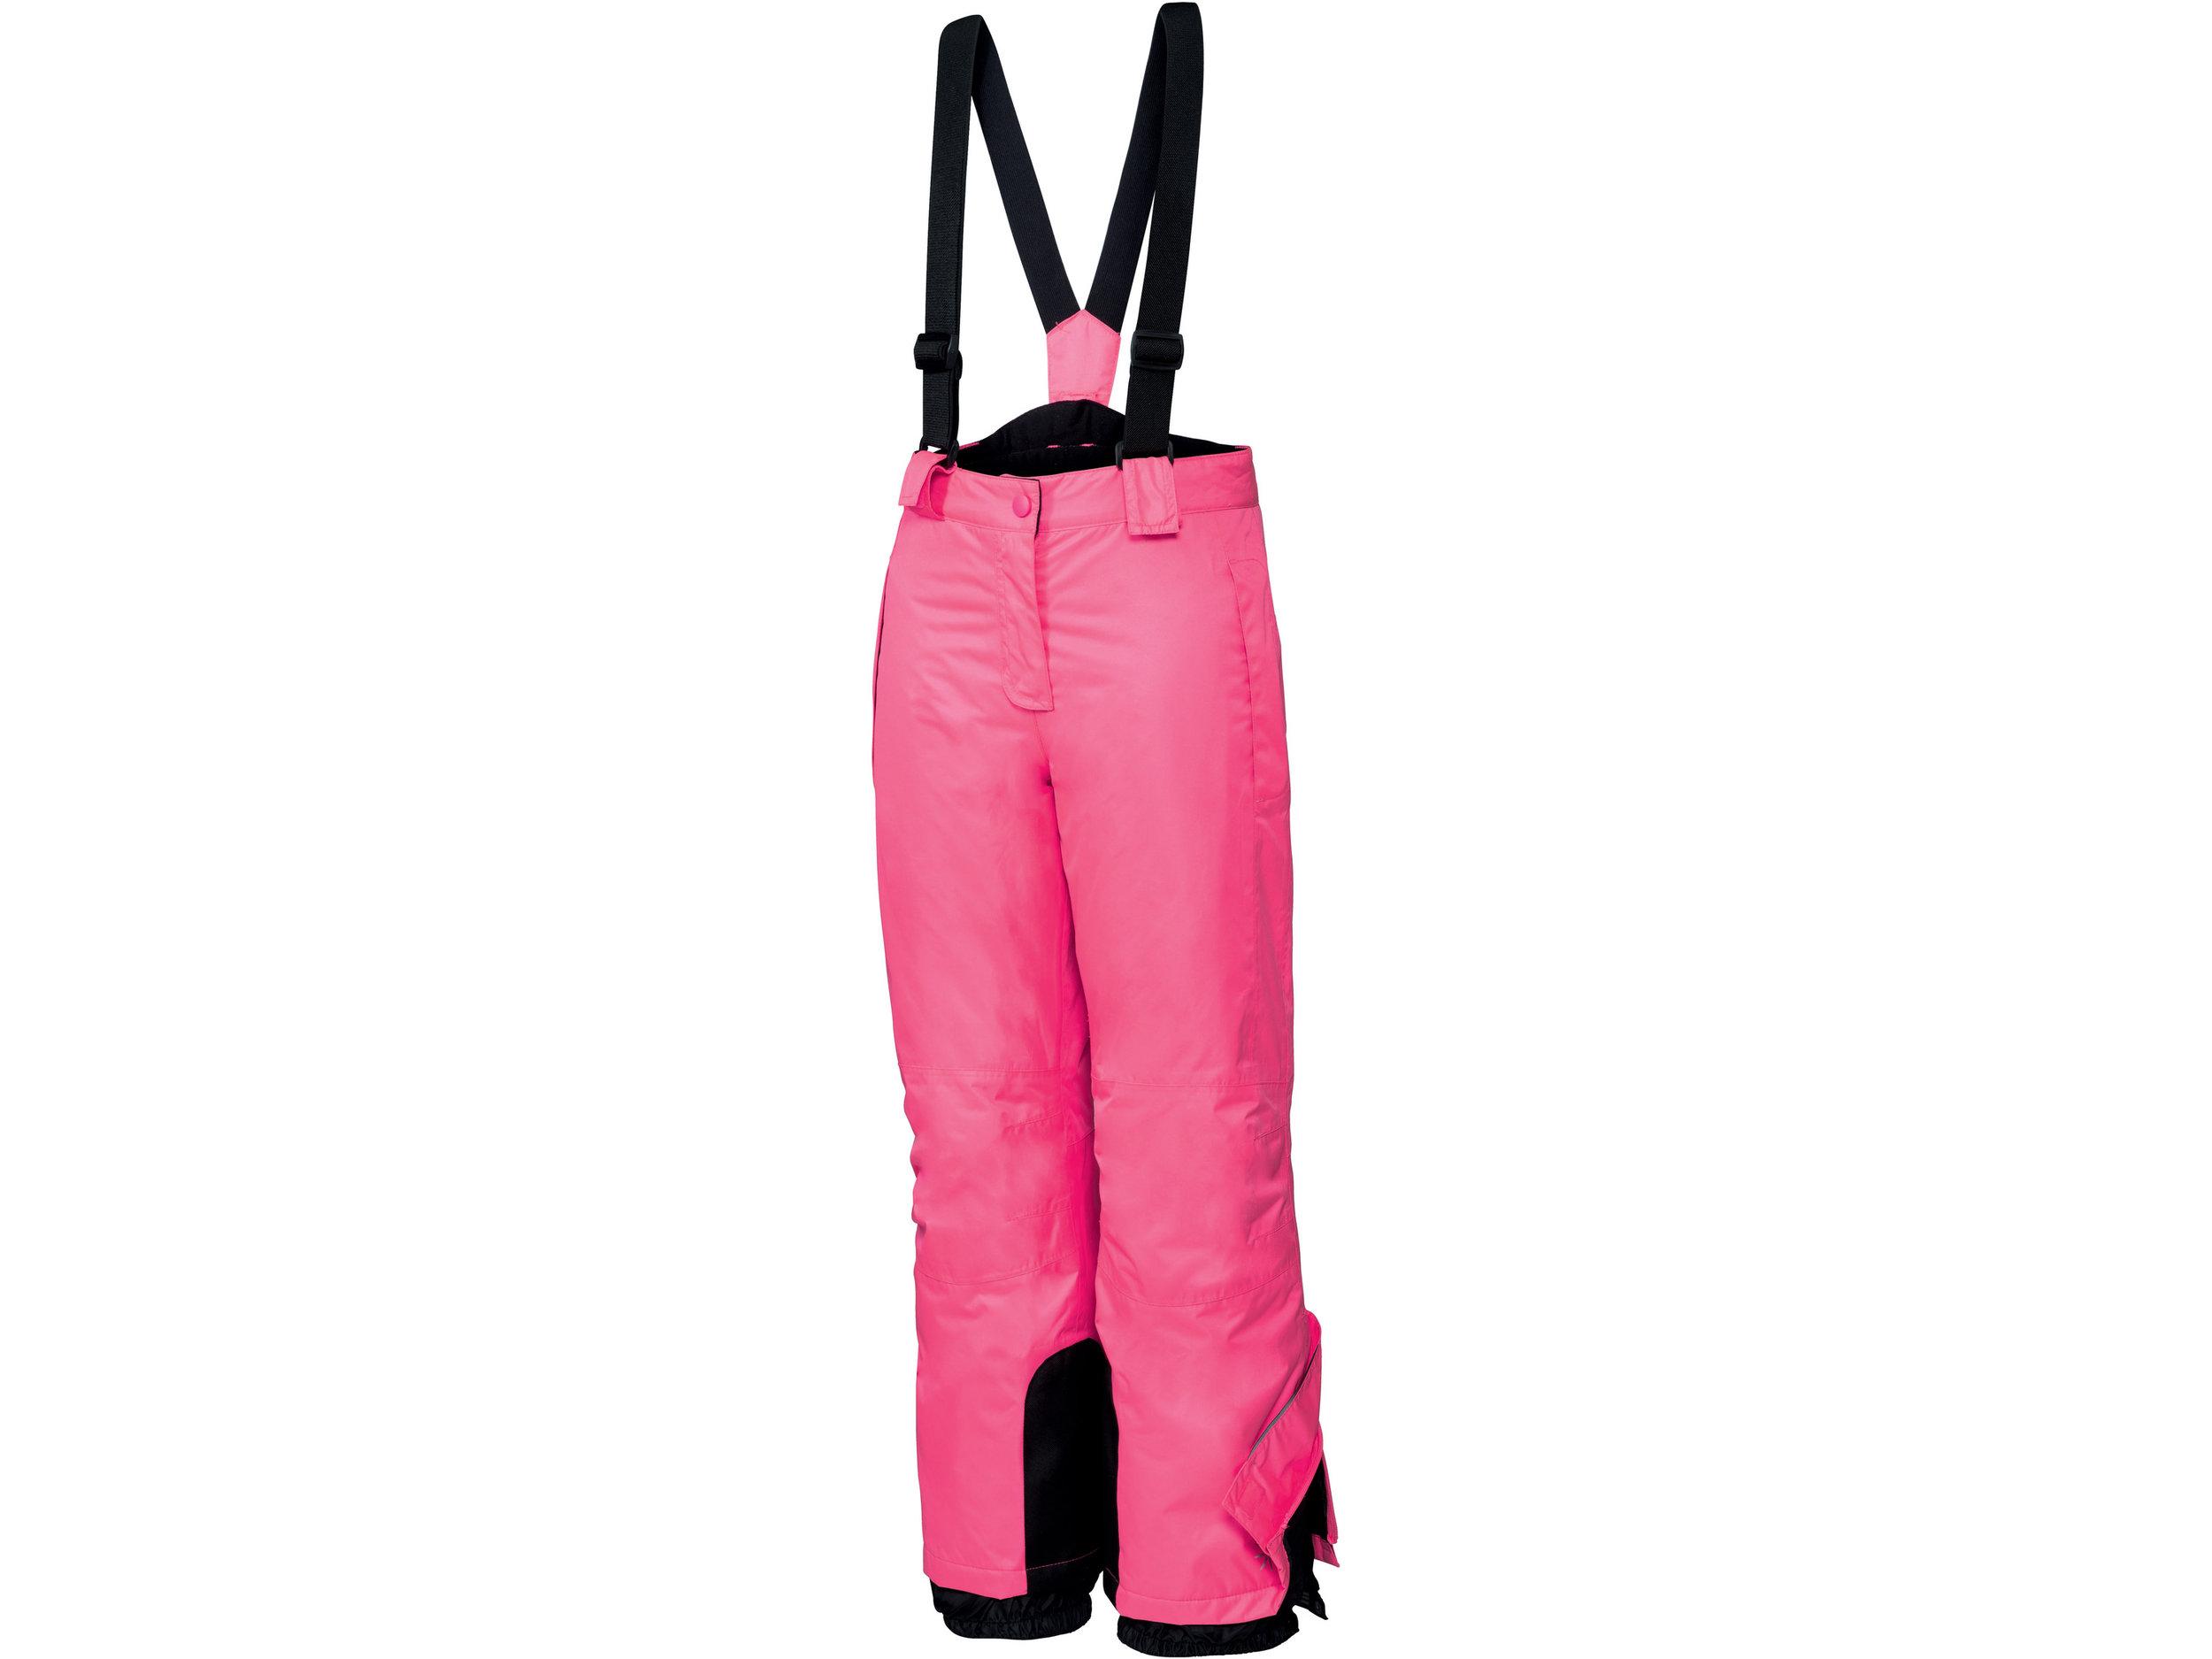 Girls' Winter Trousers £9.99 (1).JPG